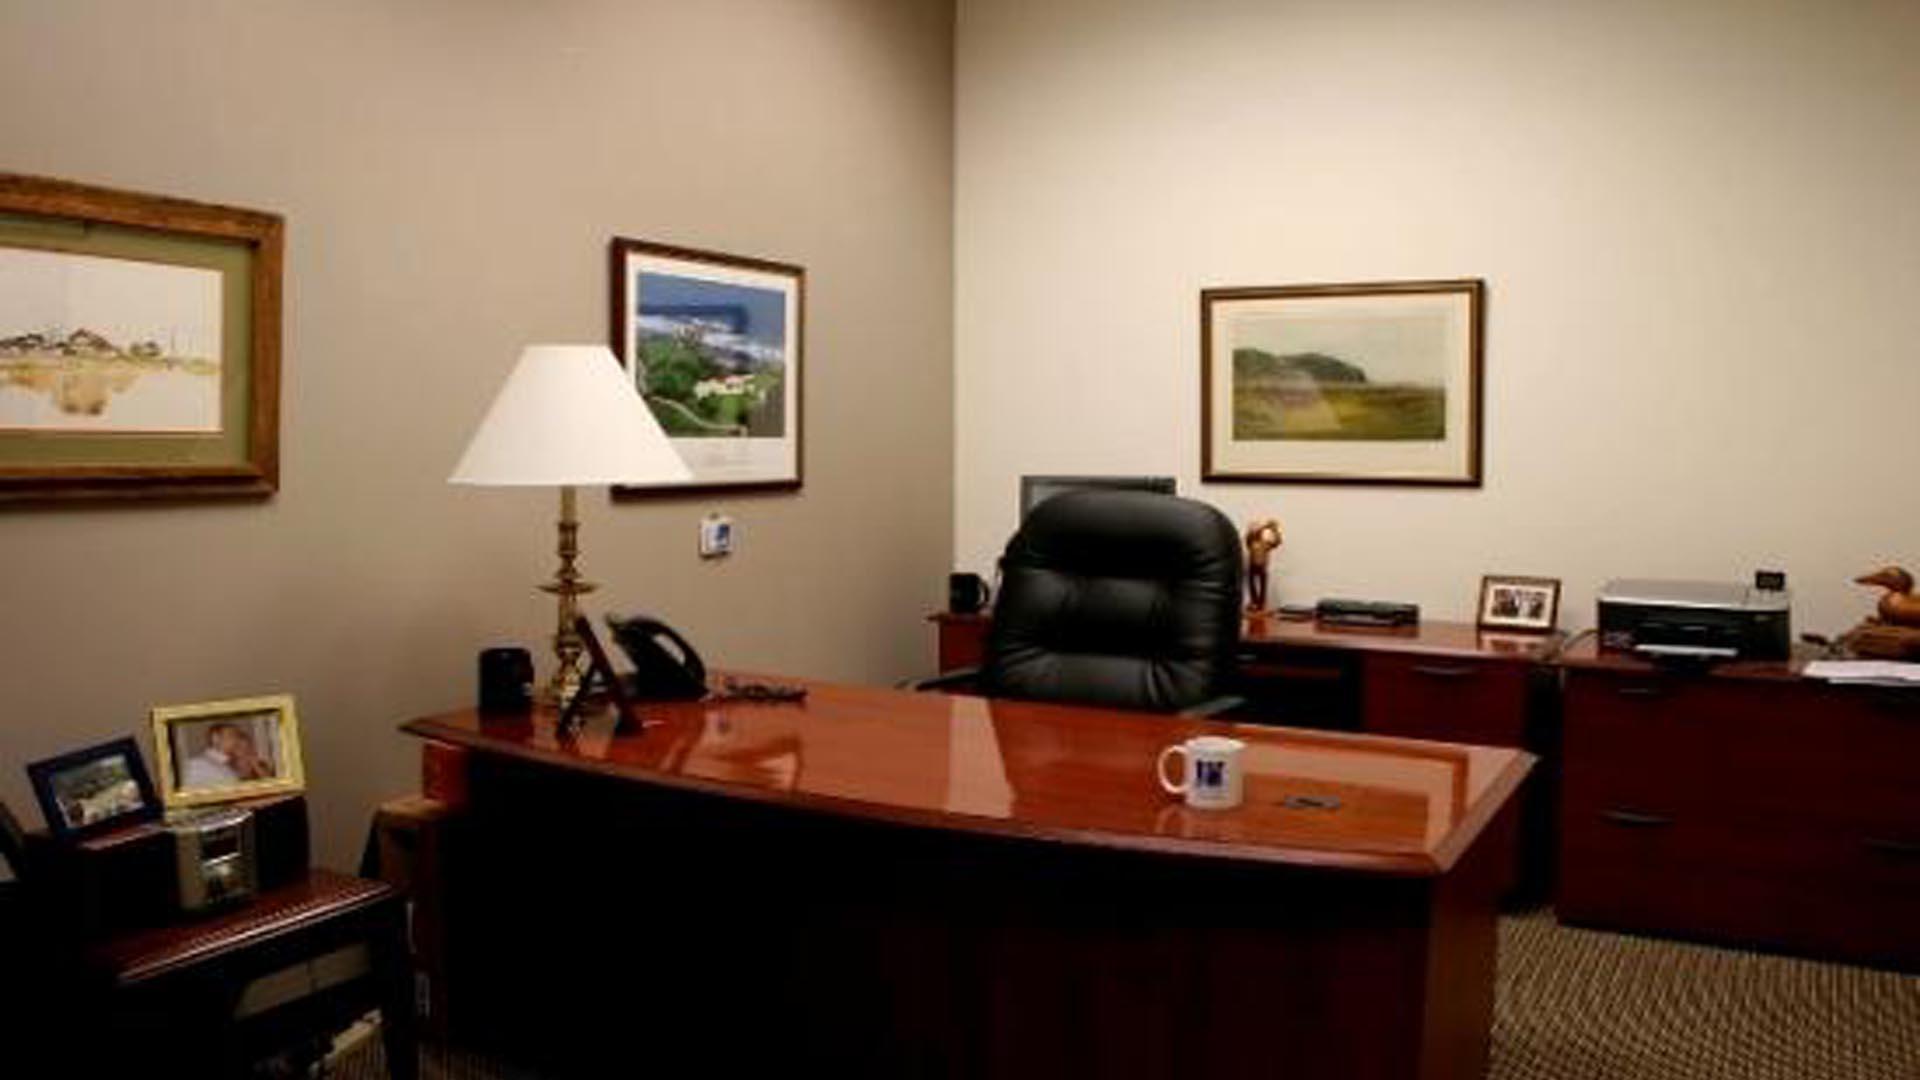 Office Room Design Gallery Office Room Title Title Room E Design